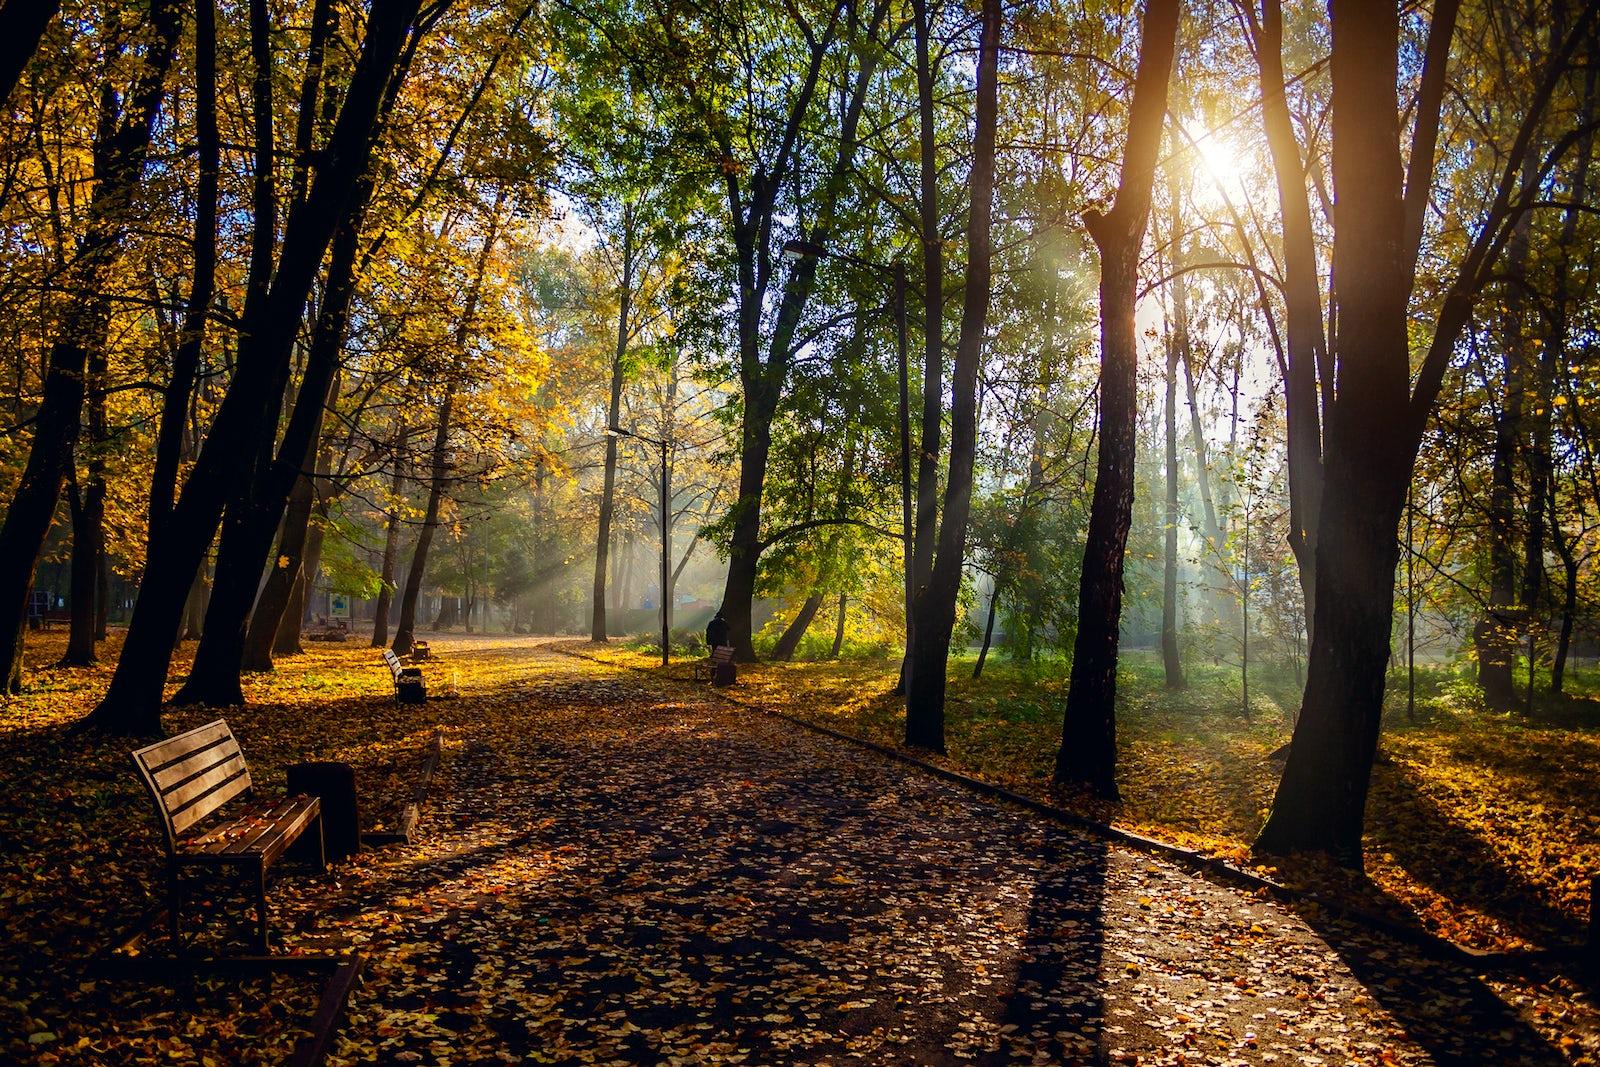 Foto © Créditos a iStock/Sergii Zyskо